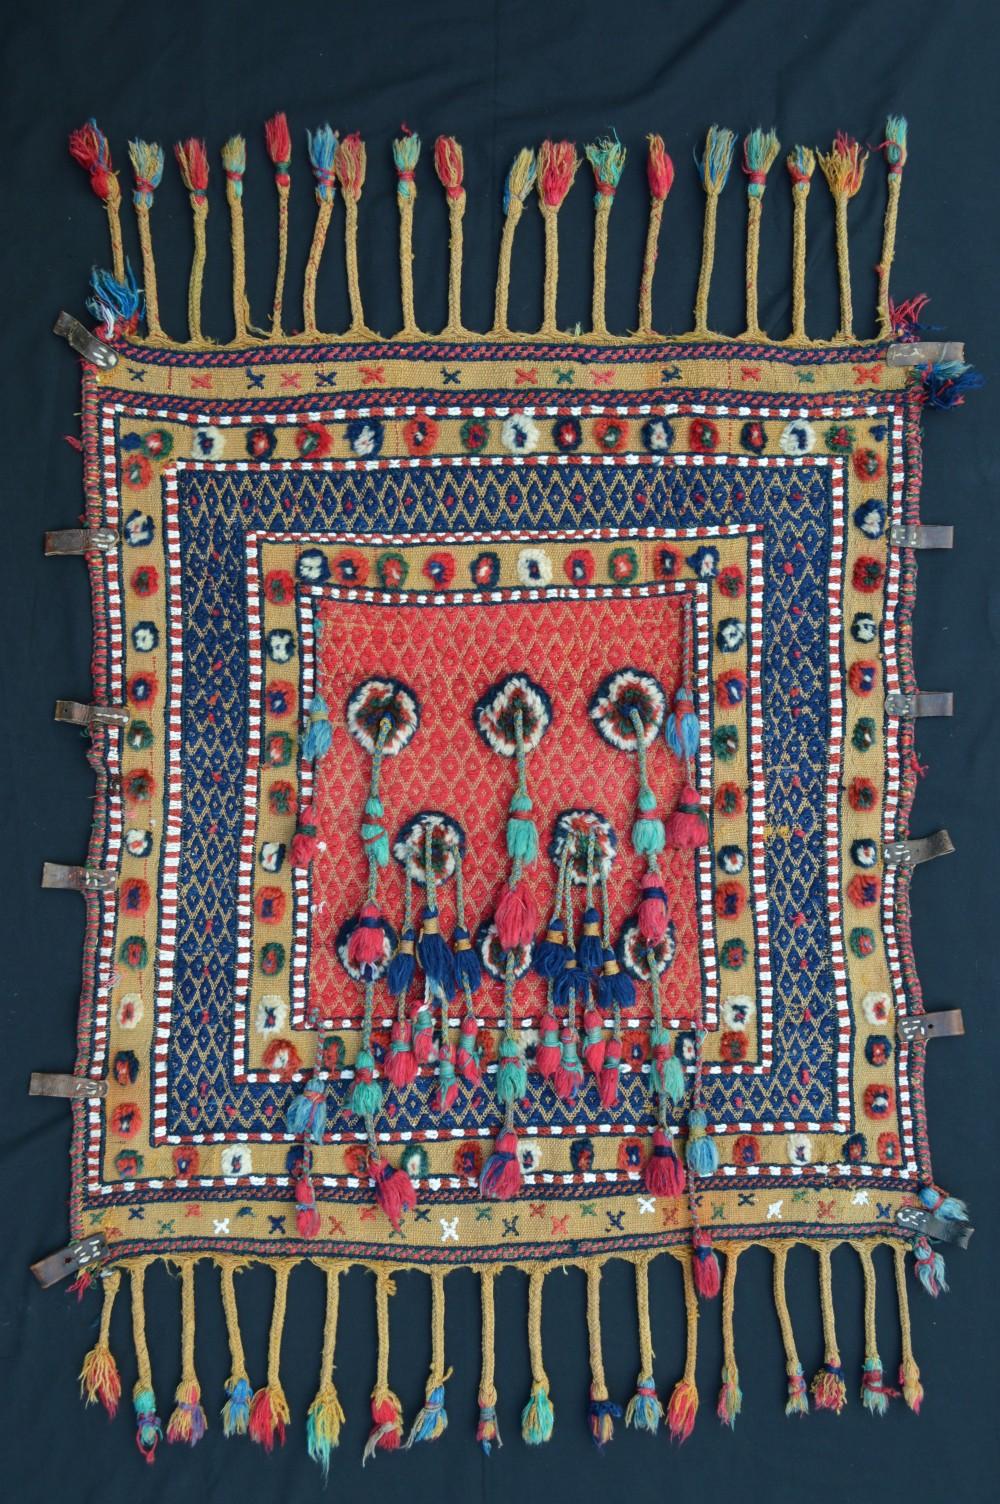 antique baby cradle qashqa'i nomads fars province southwest persia